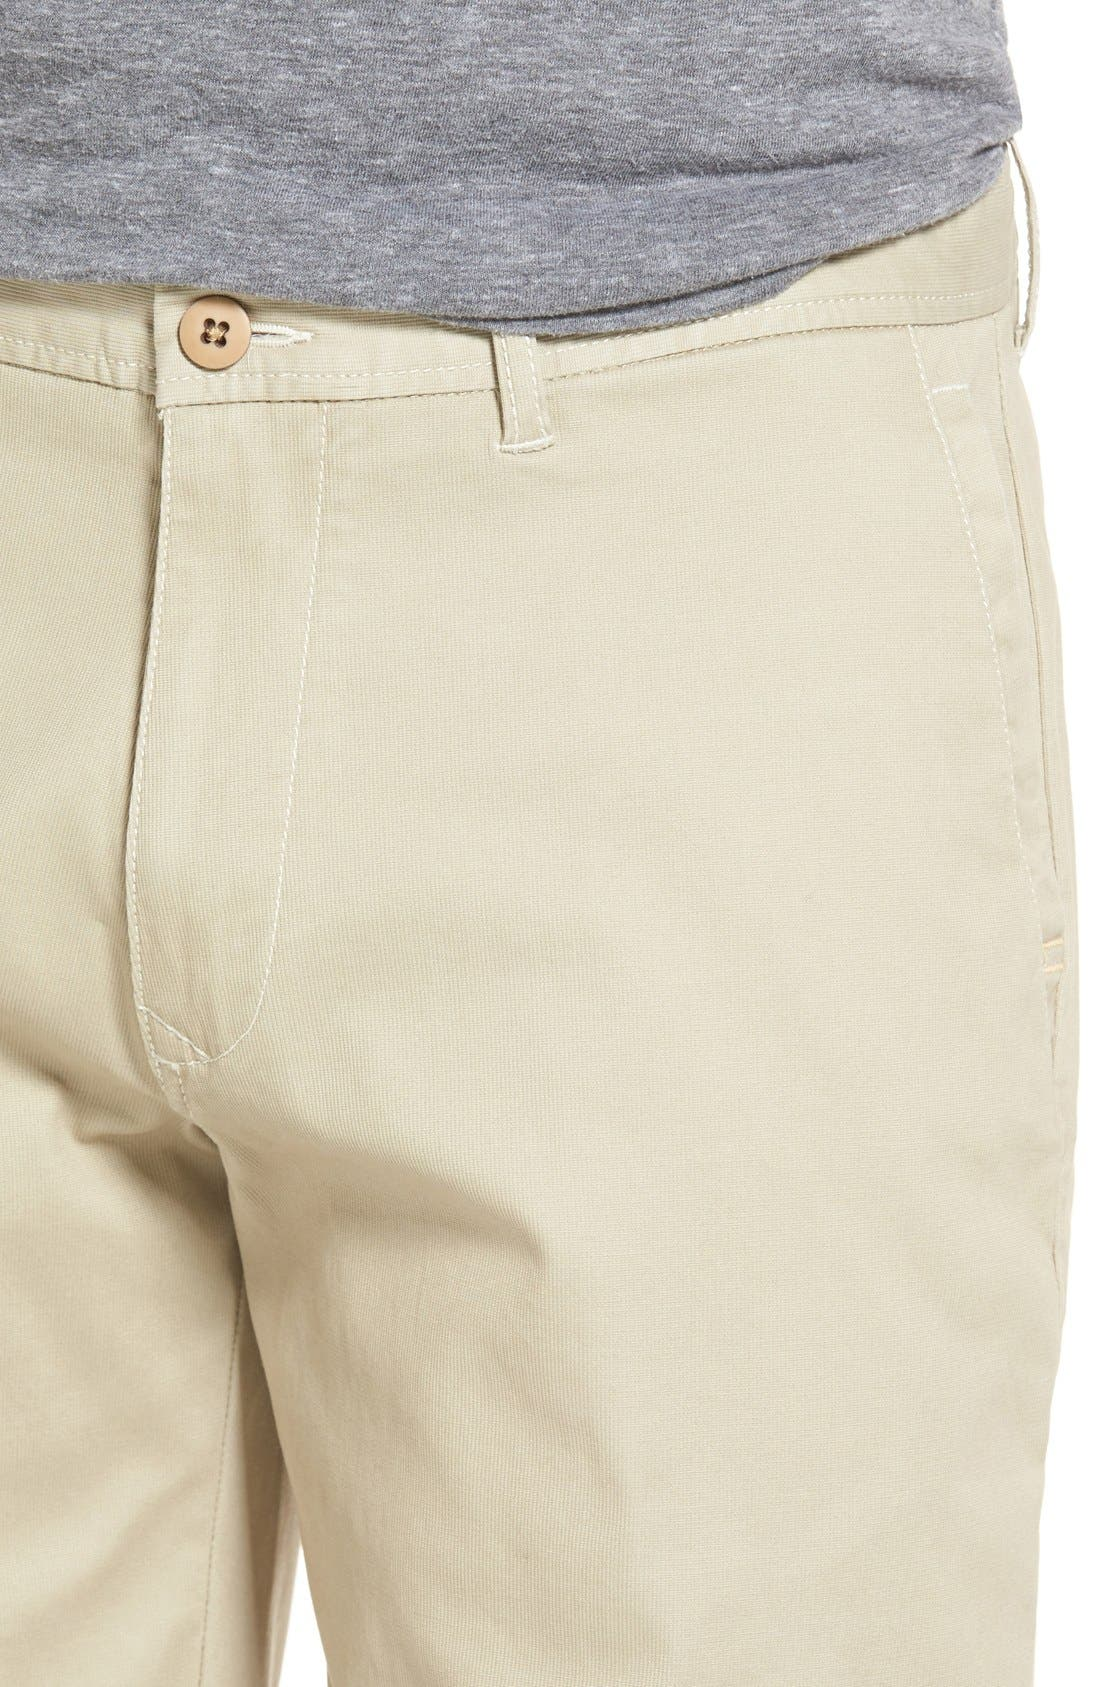 'Bedford & Sons' Shorts,                             Alternate thumbnail 35, color,